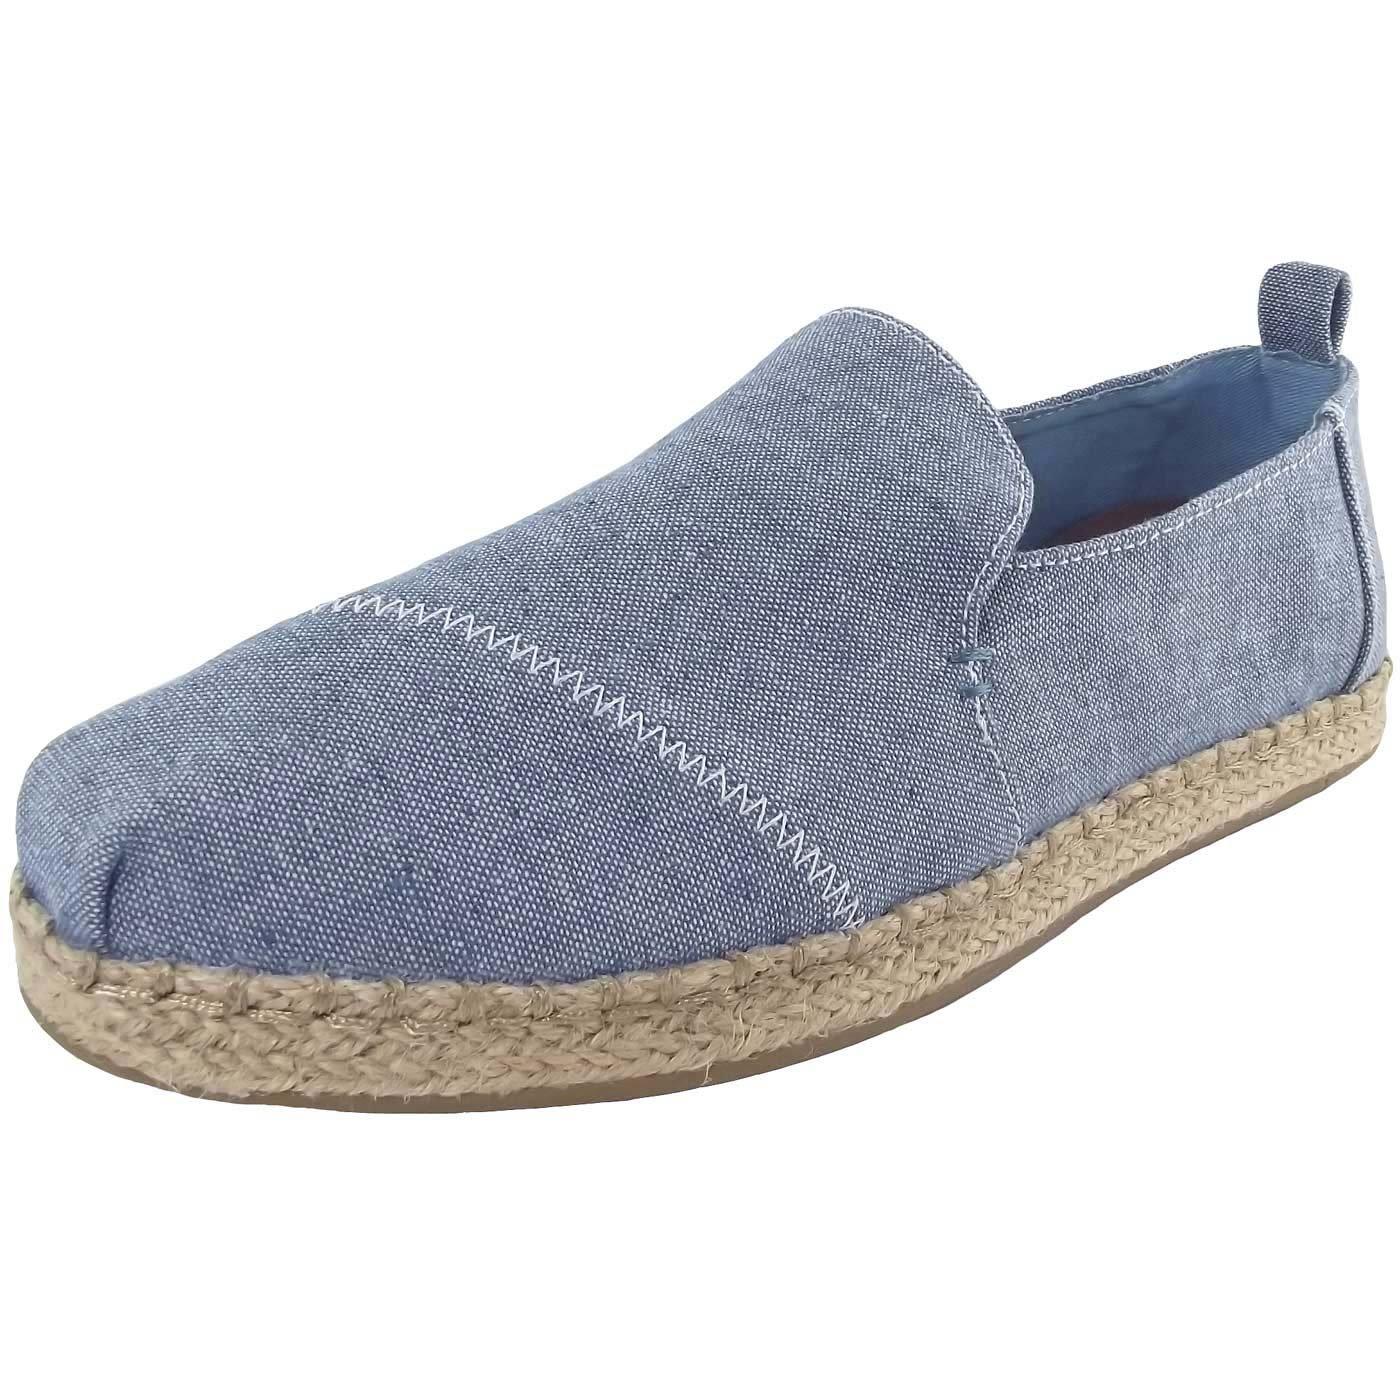 TOMS Women's Alpargata Casual Shoe Blue Slub Chambray 6